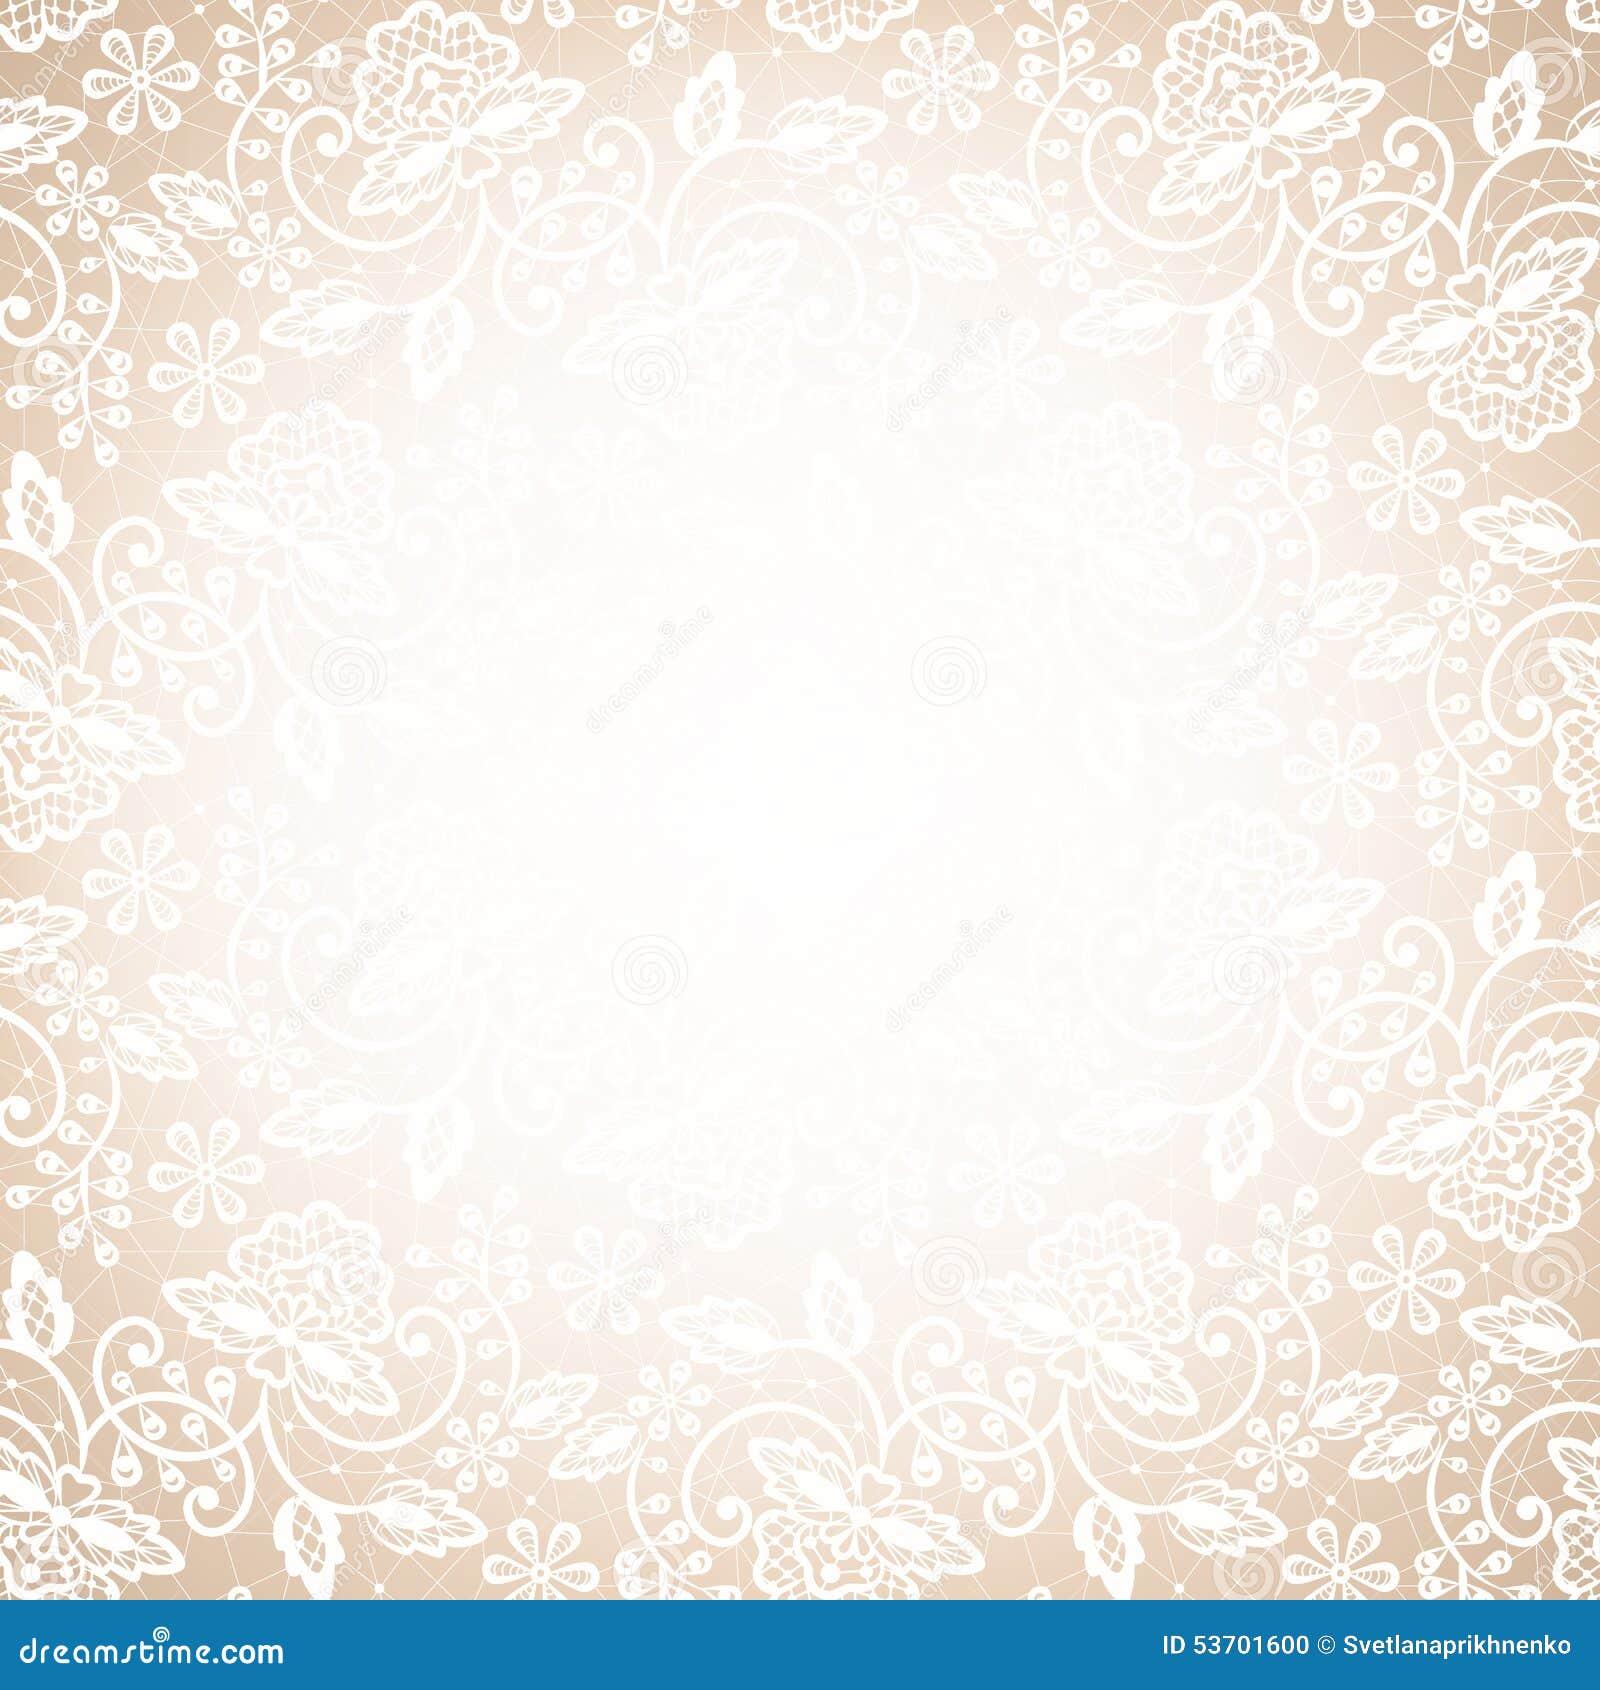 Lace Frame Beige Background Template Wedding Invitation Greeting Card White Logo Shabby Gratis